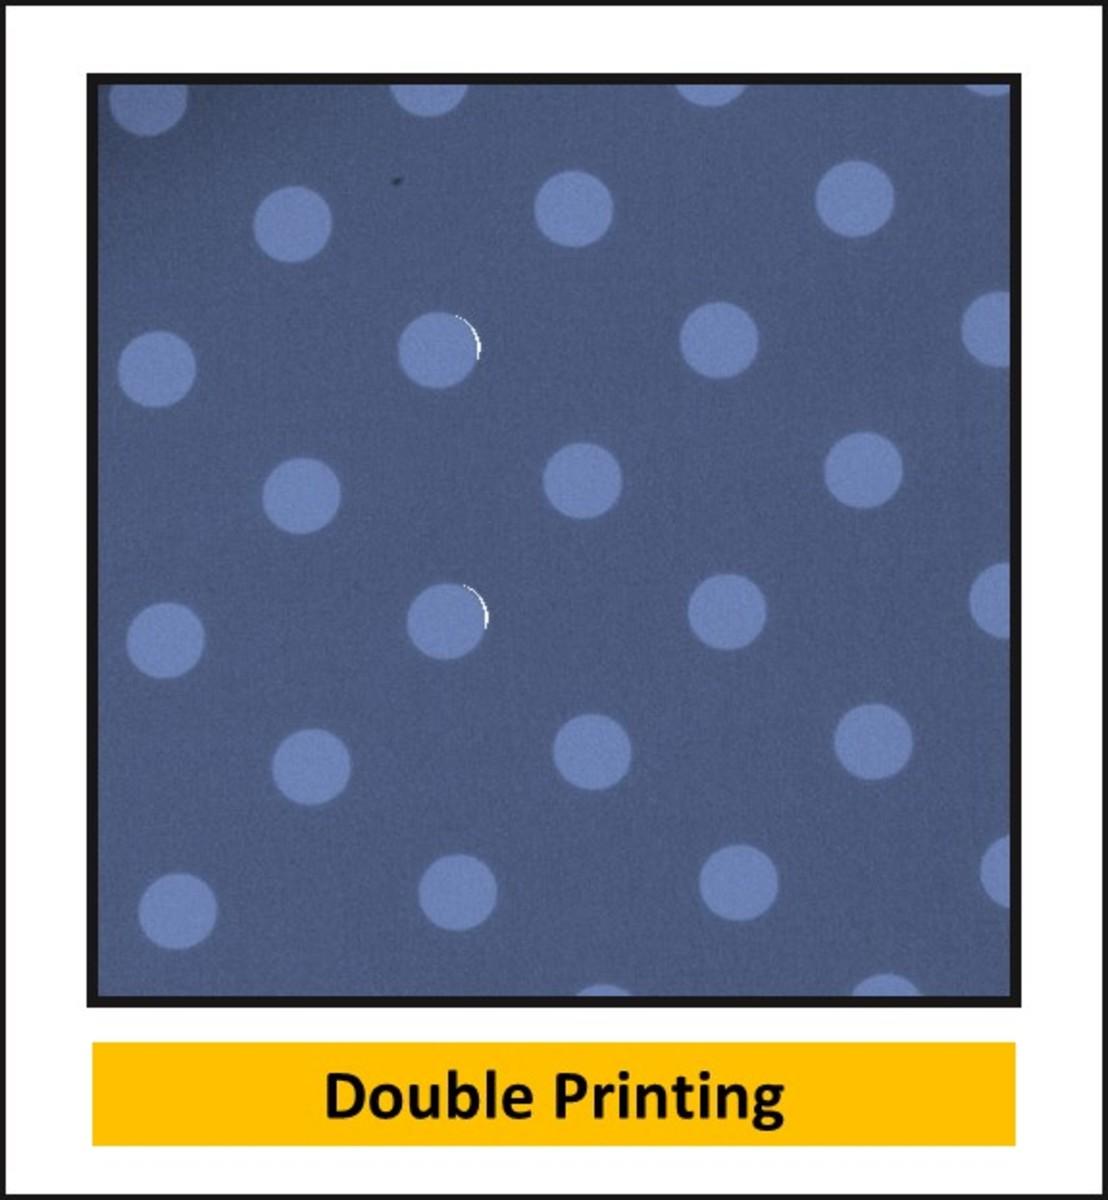 Double Printing